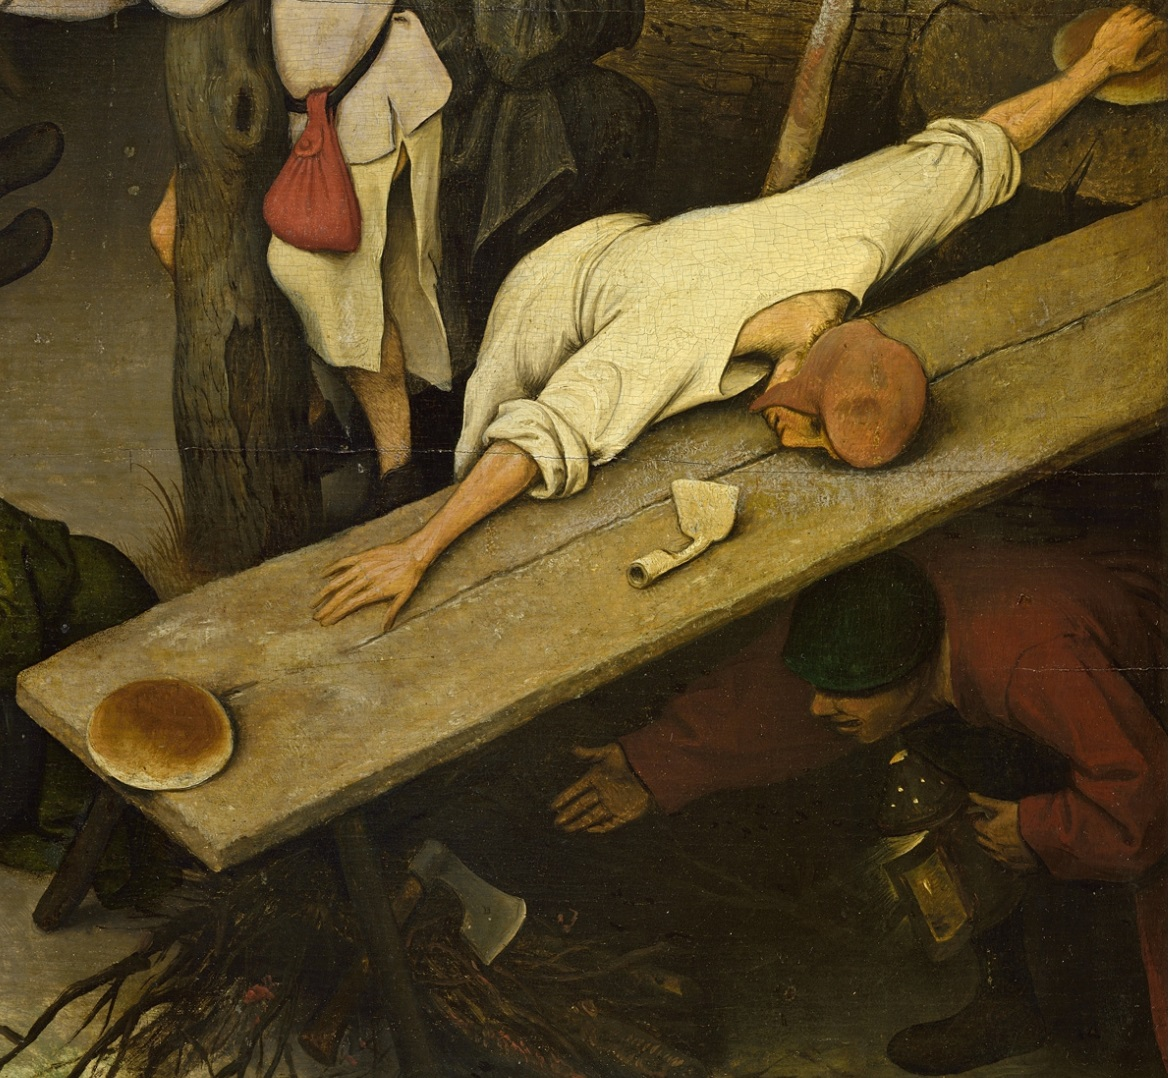 brueghel-proverbs-036.jpg